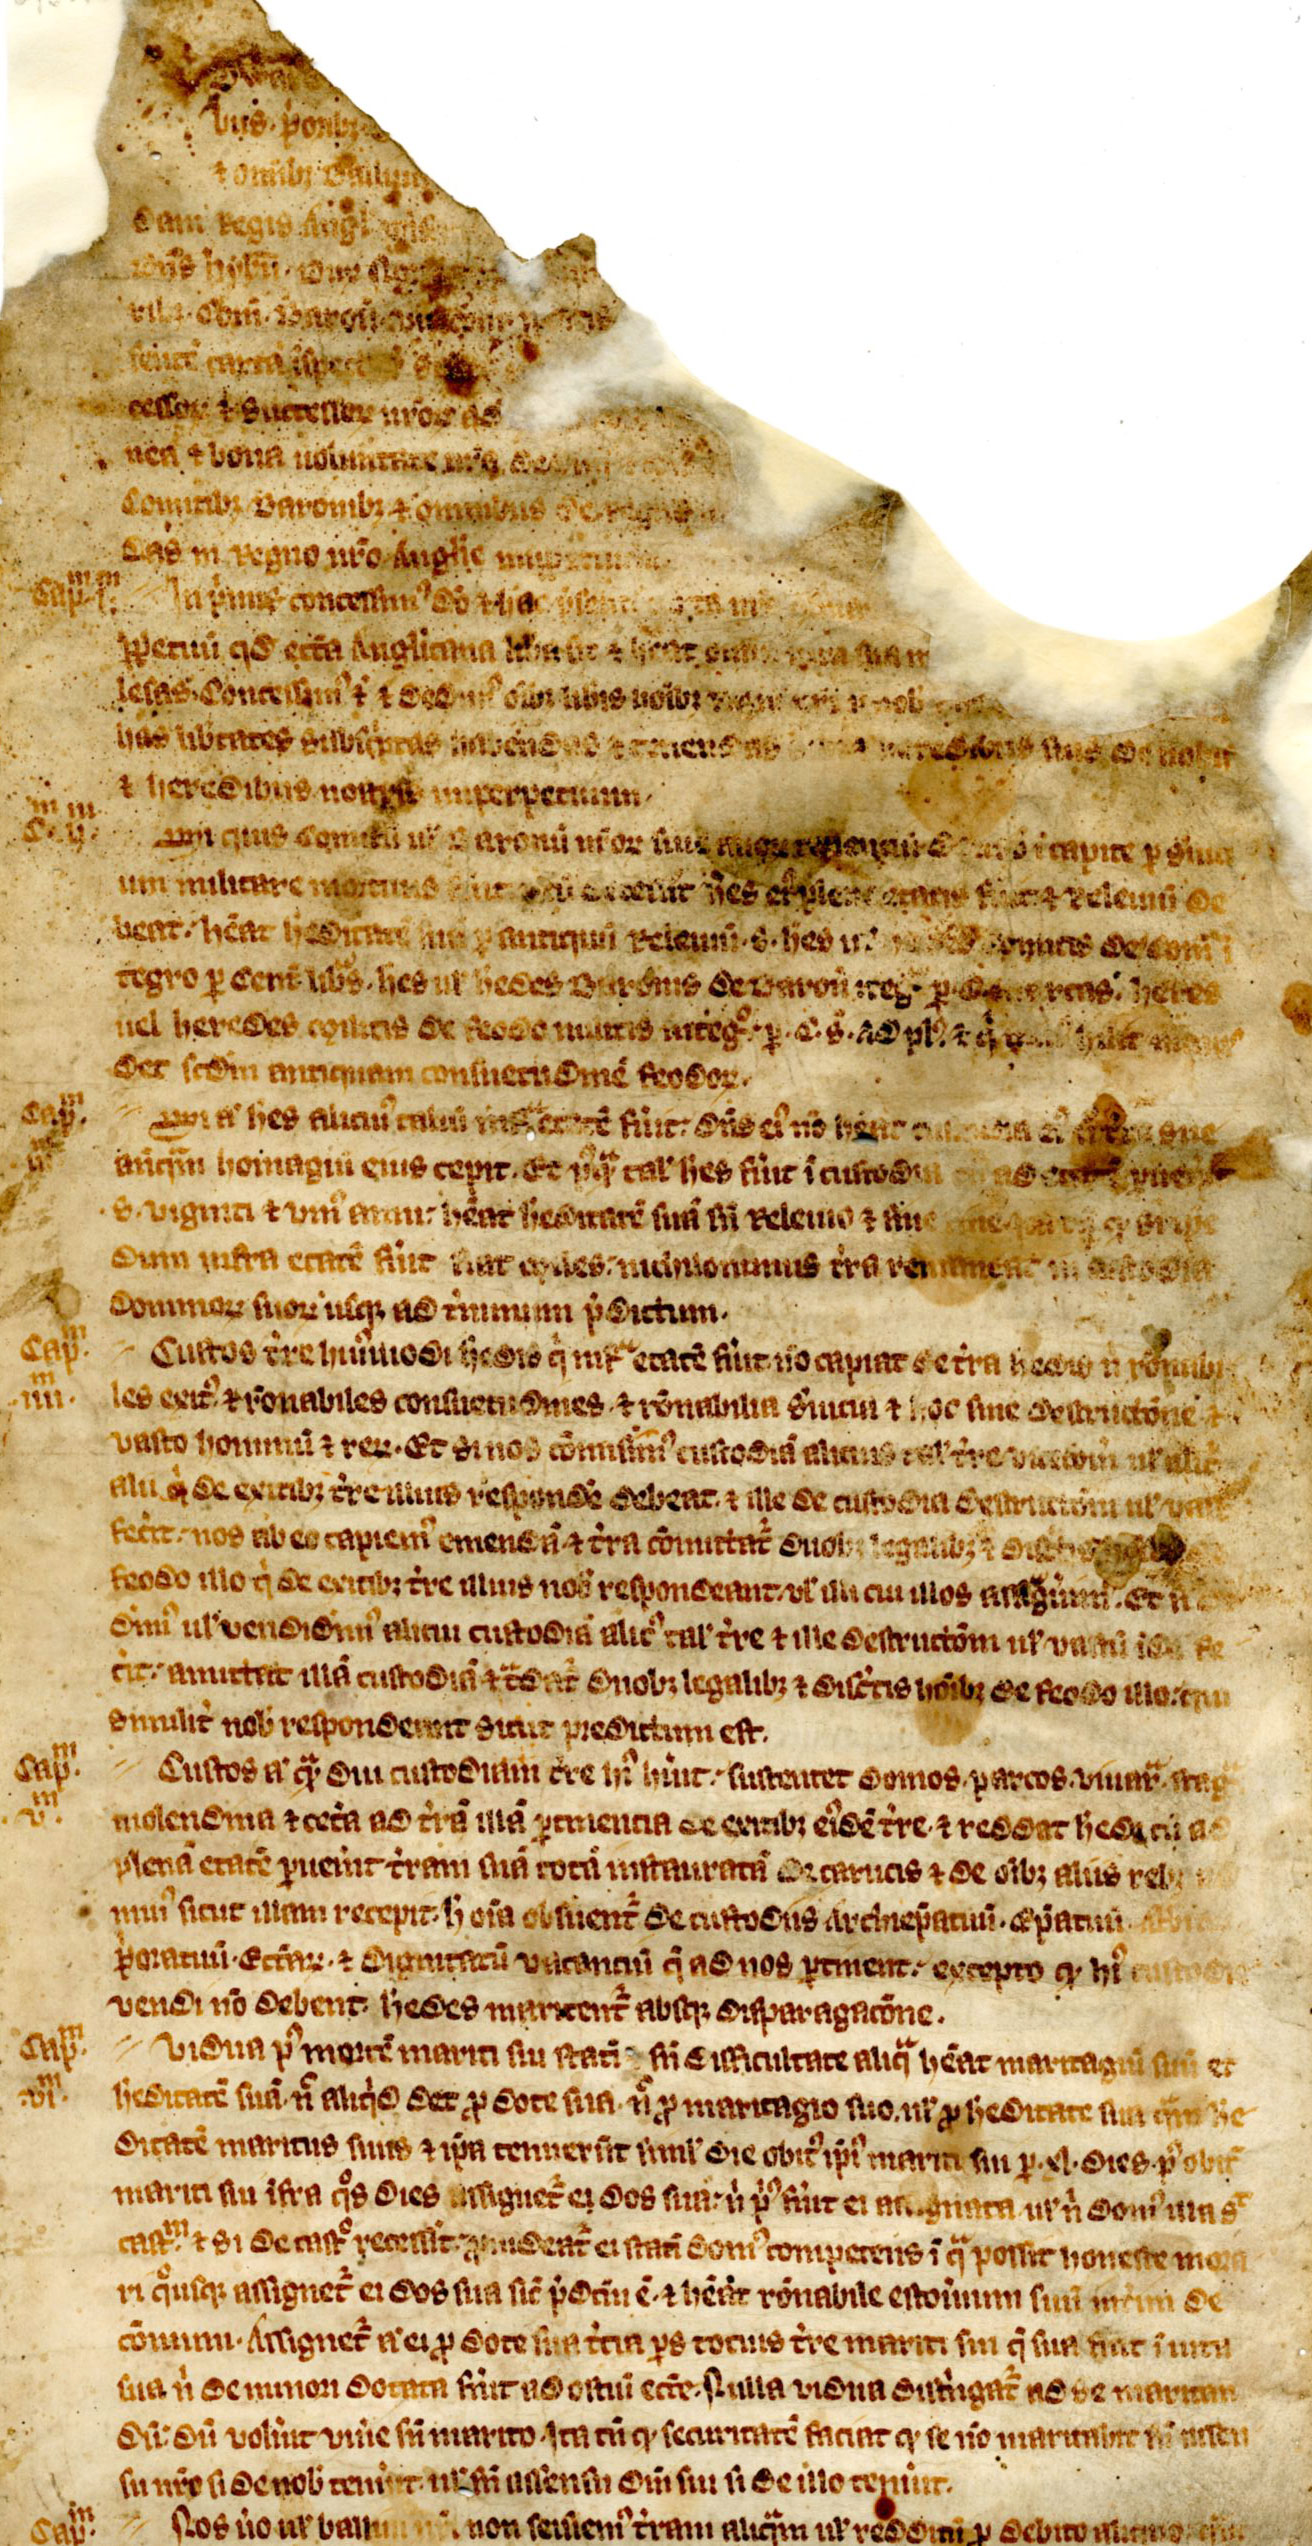 14th century copy of Magna Carta at SJC